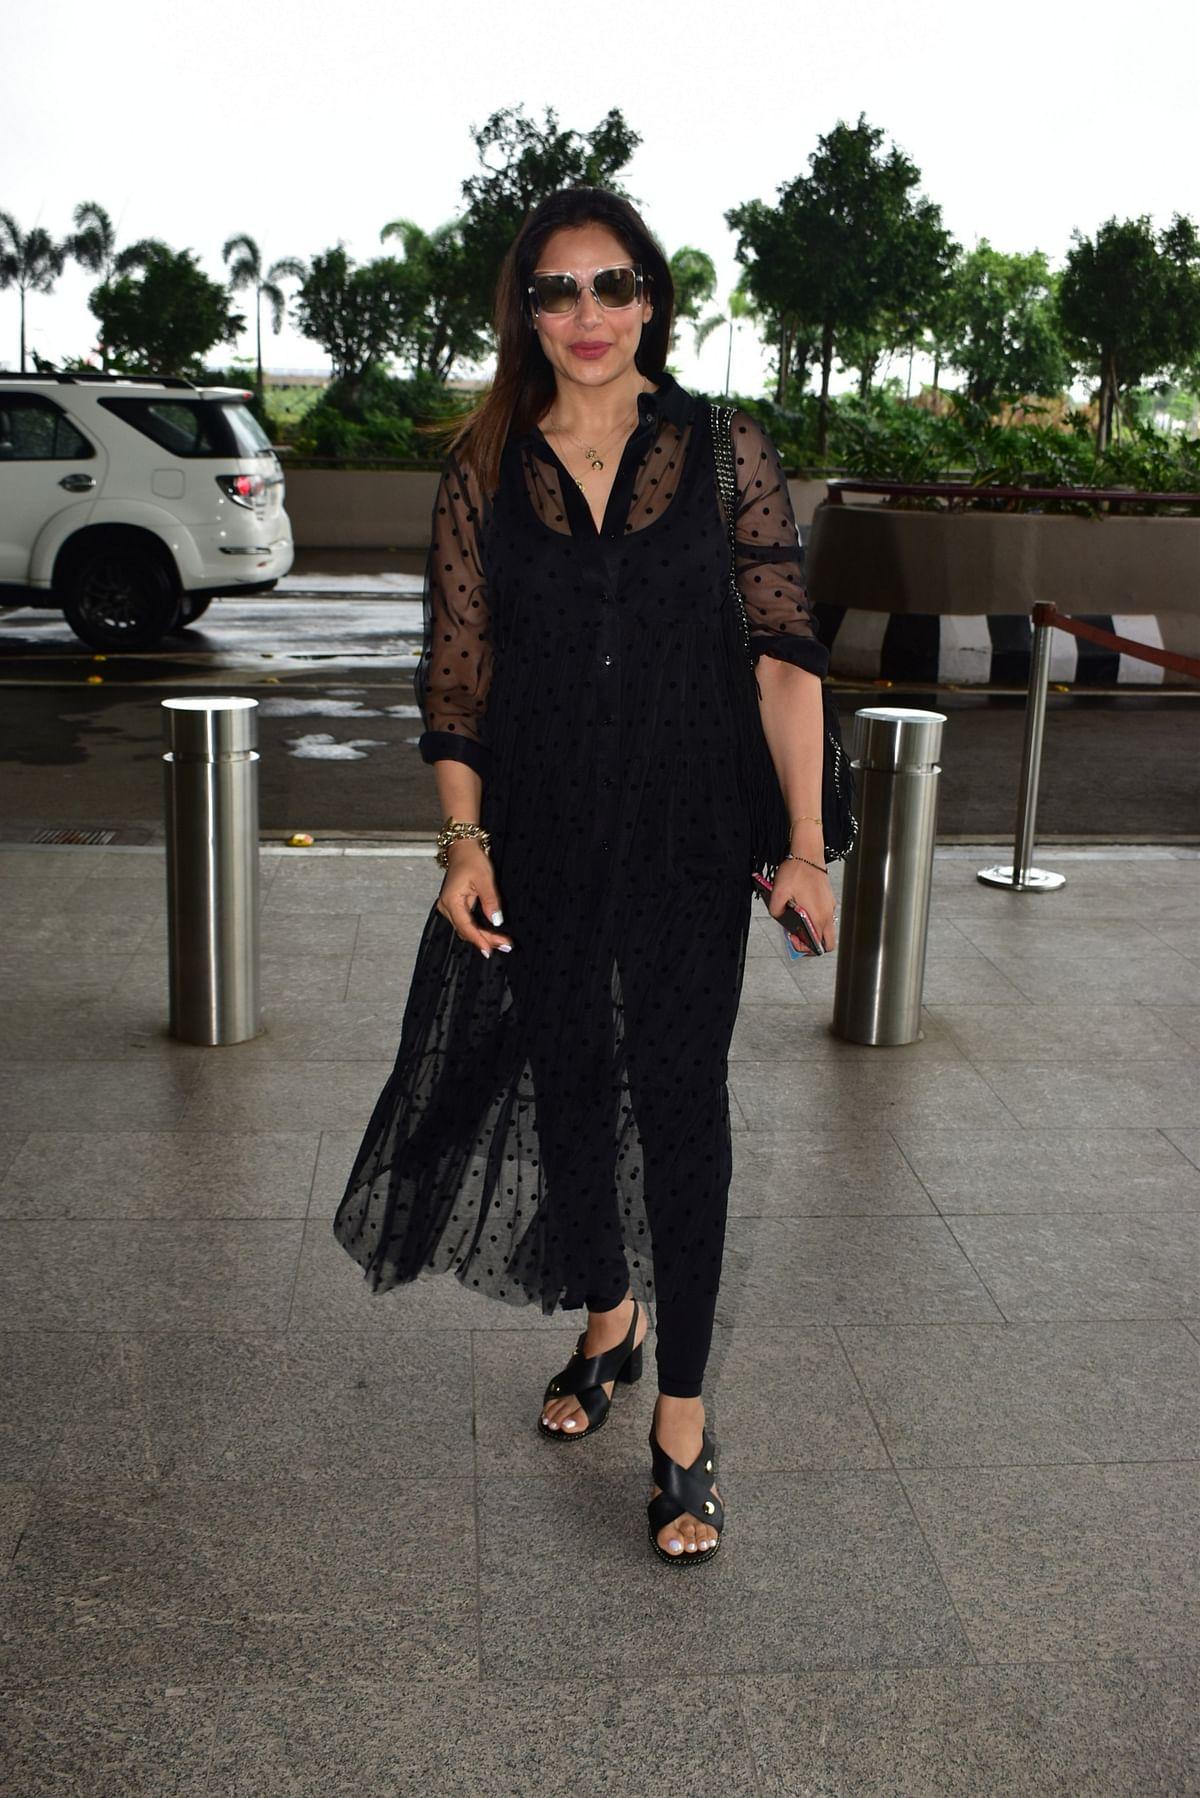 Bipasha Basu in black outfit at Airport